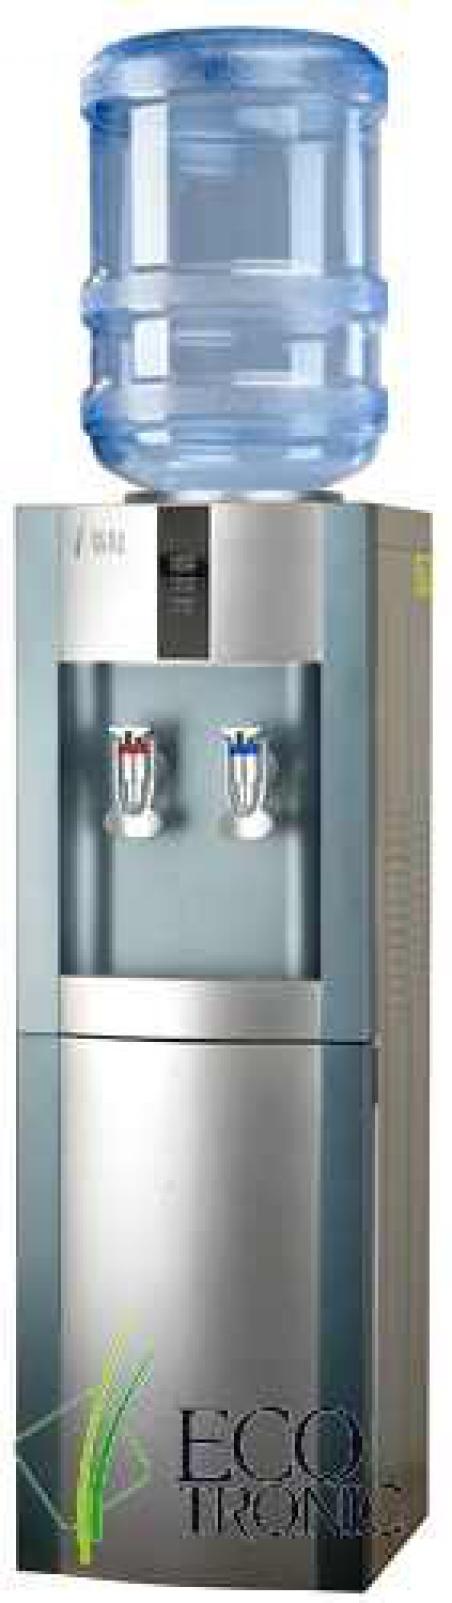 Кулер для воды Ecotronic H1-L - 149